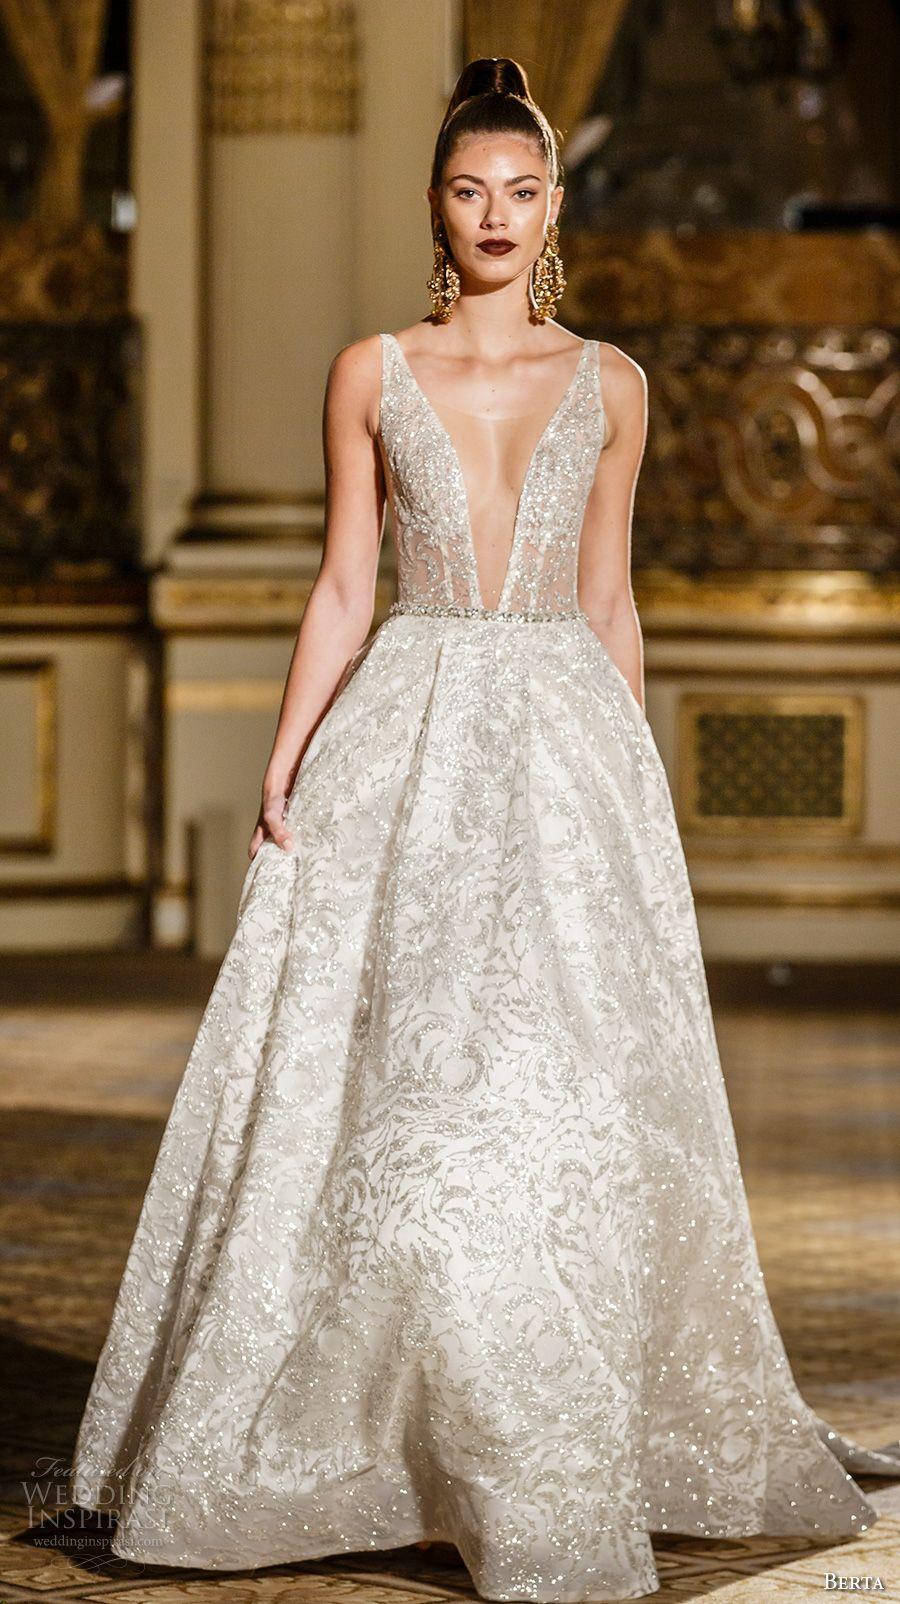 Berta Spring 2018 Wedding Dresses New York Bridal Fashion Week Runway Show Wedding Inspirasi Wedding Dresses Wedding Dress Couture Short Wedding Gowns